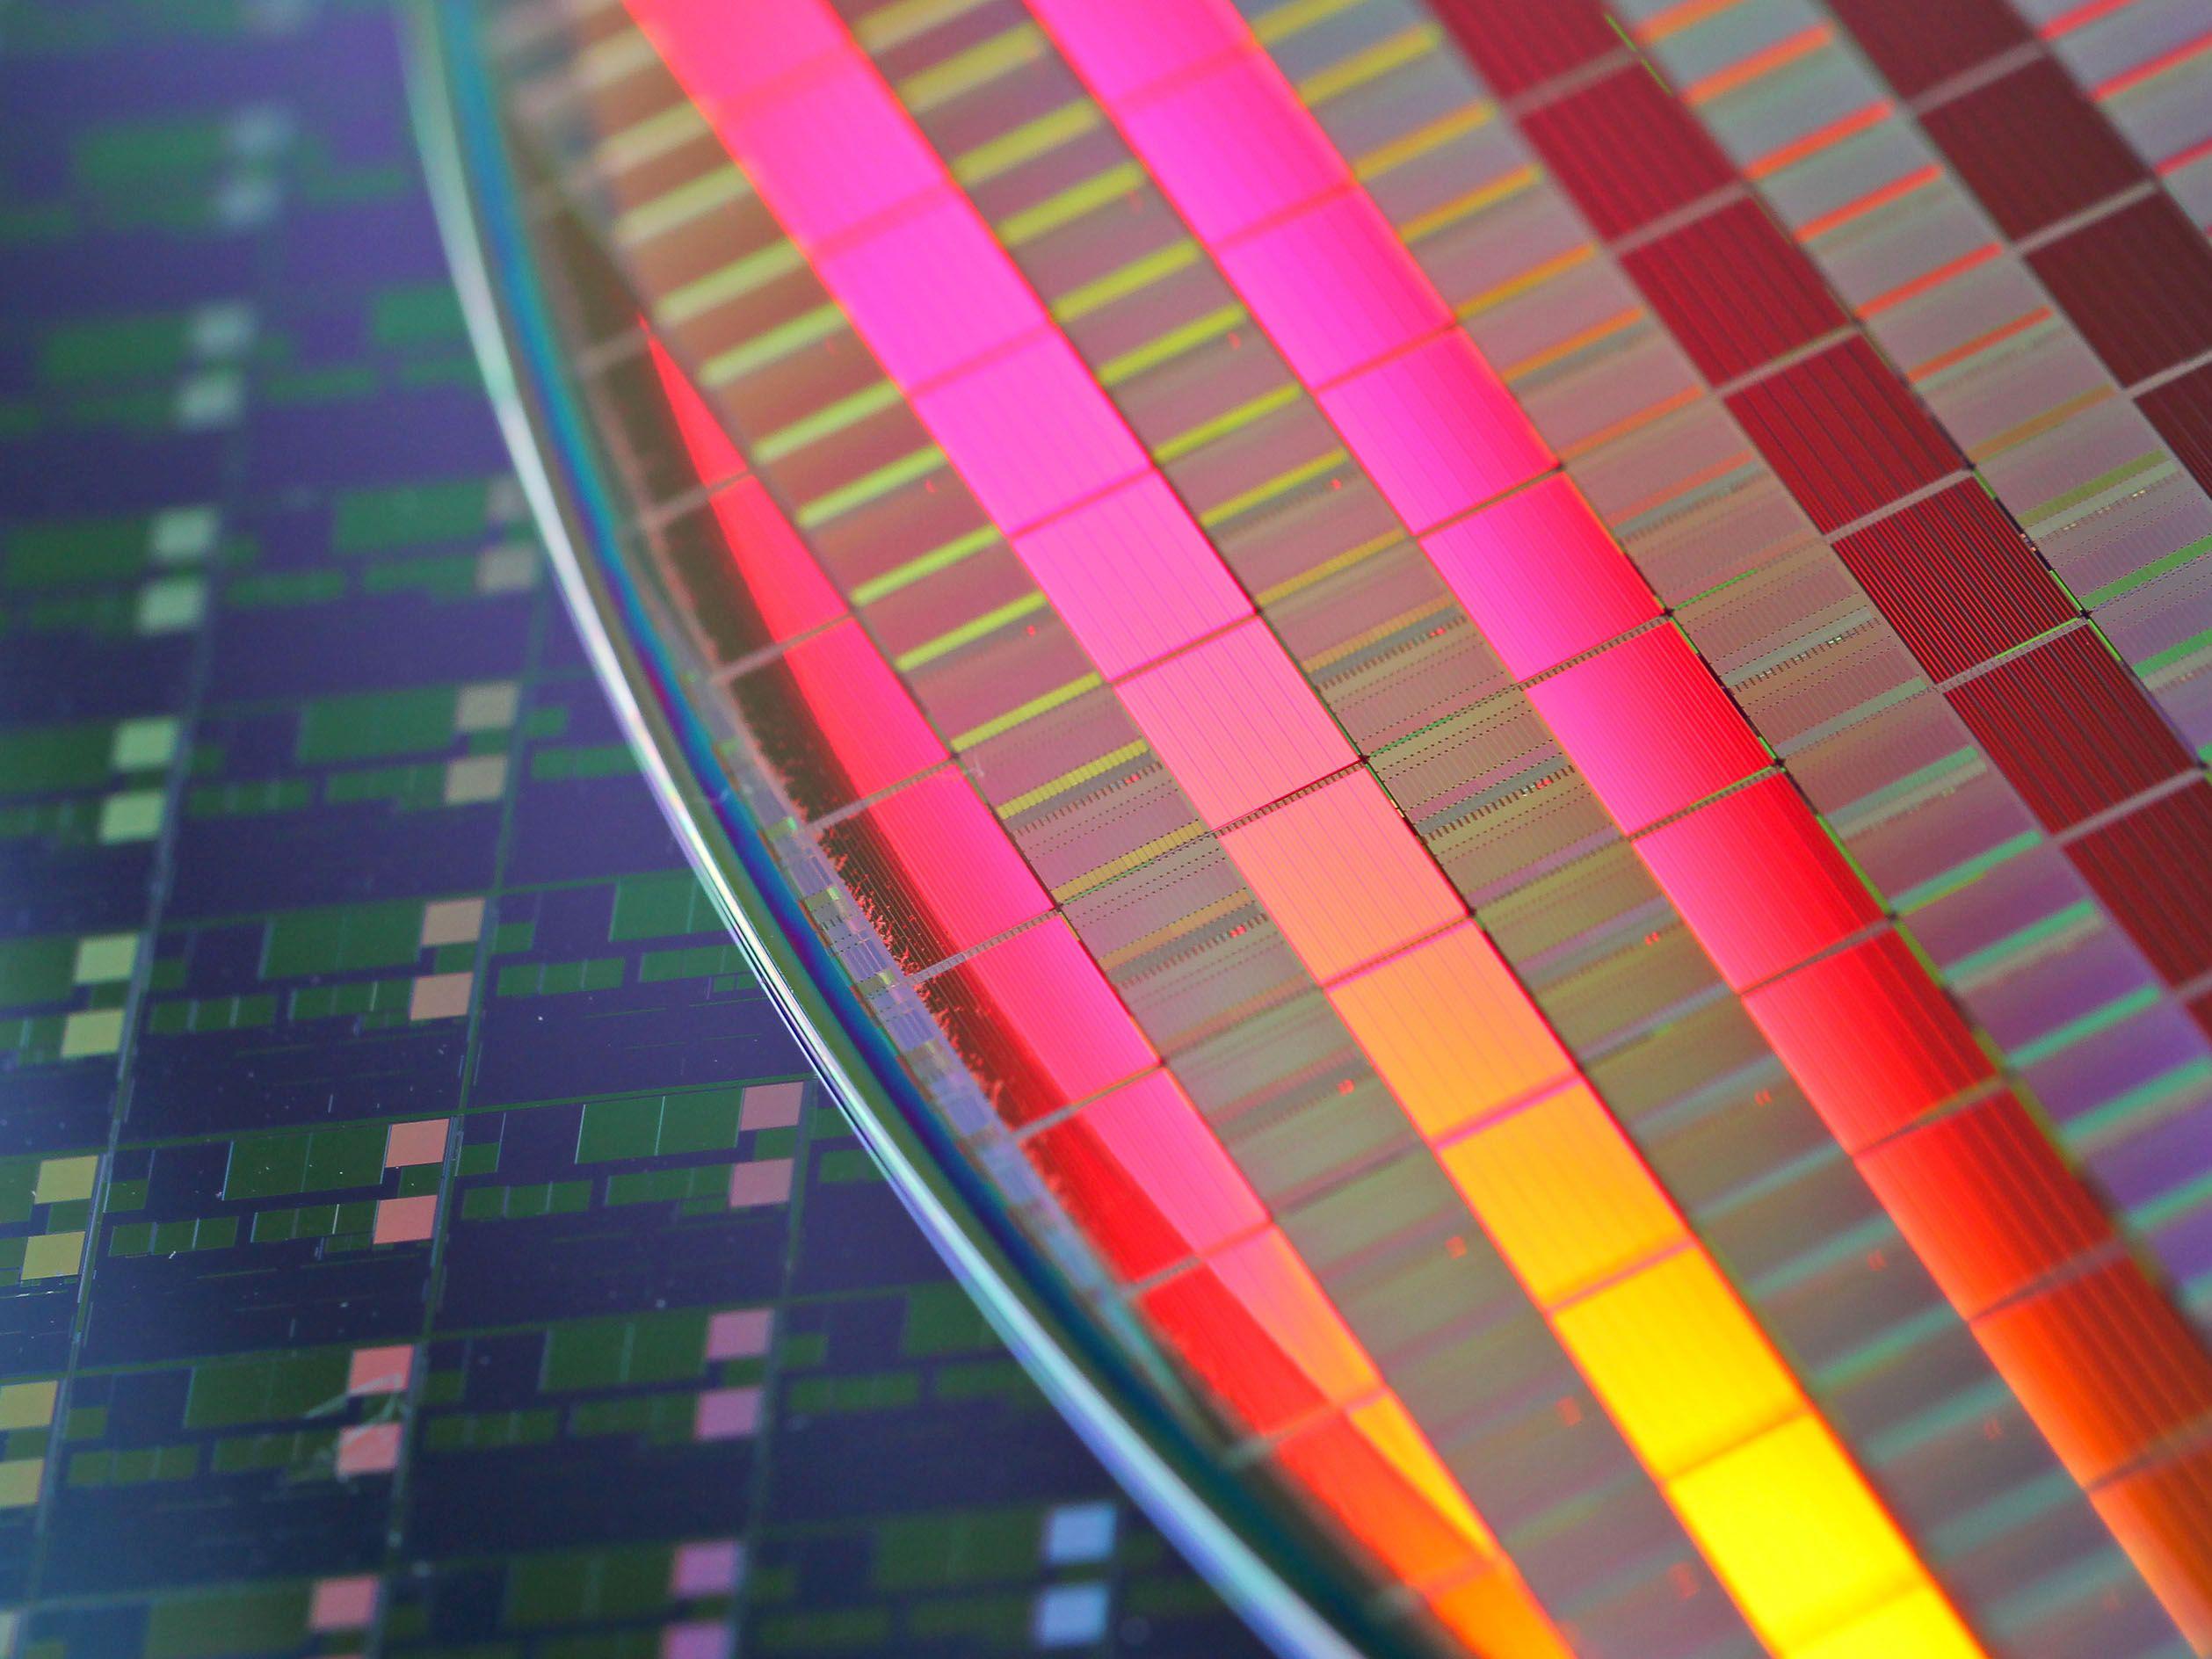 Top Global Chipmakers Resist Biden Bid for Supply Chain Data